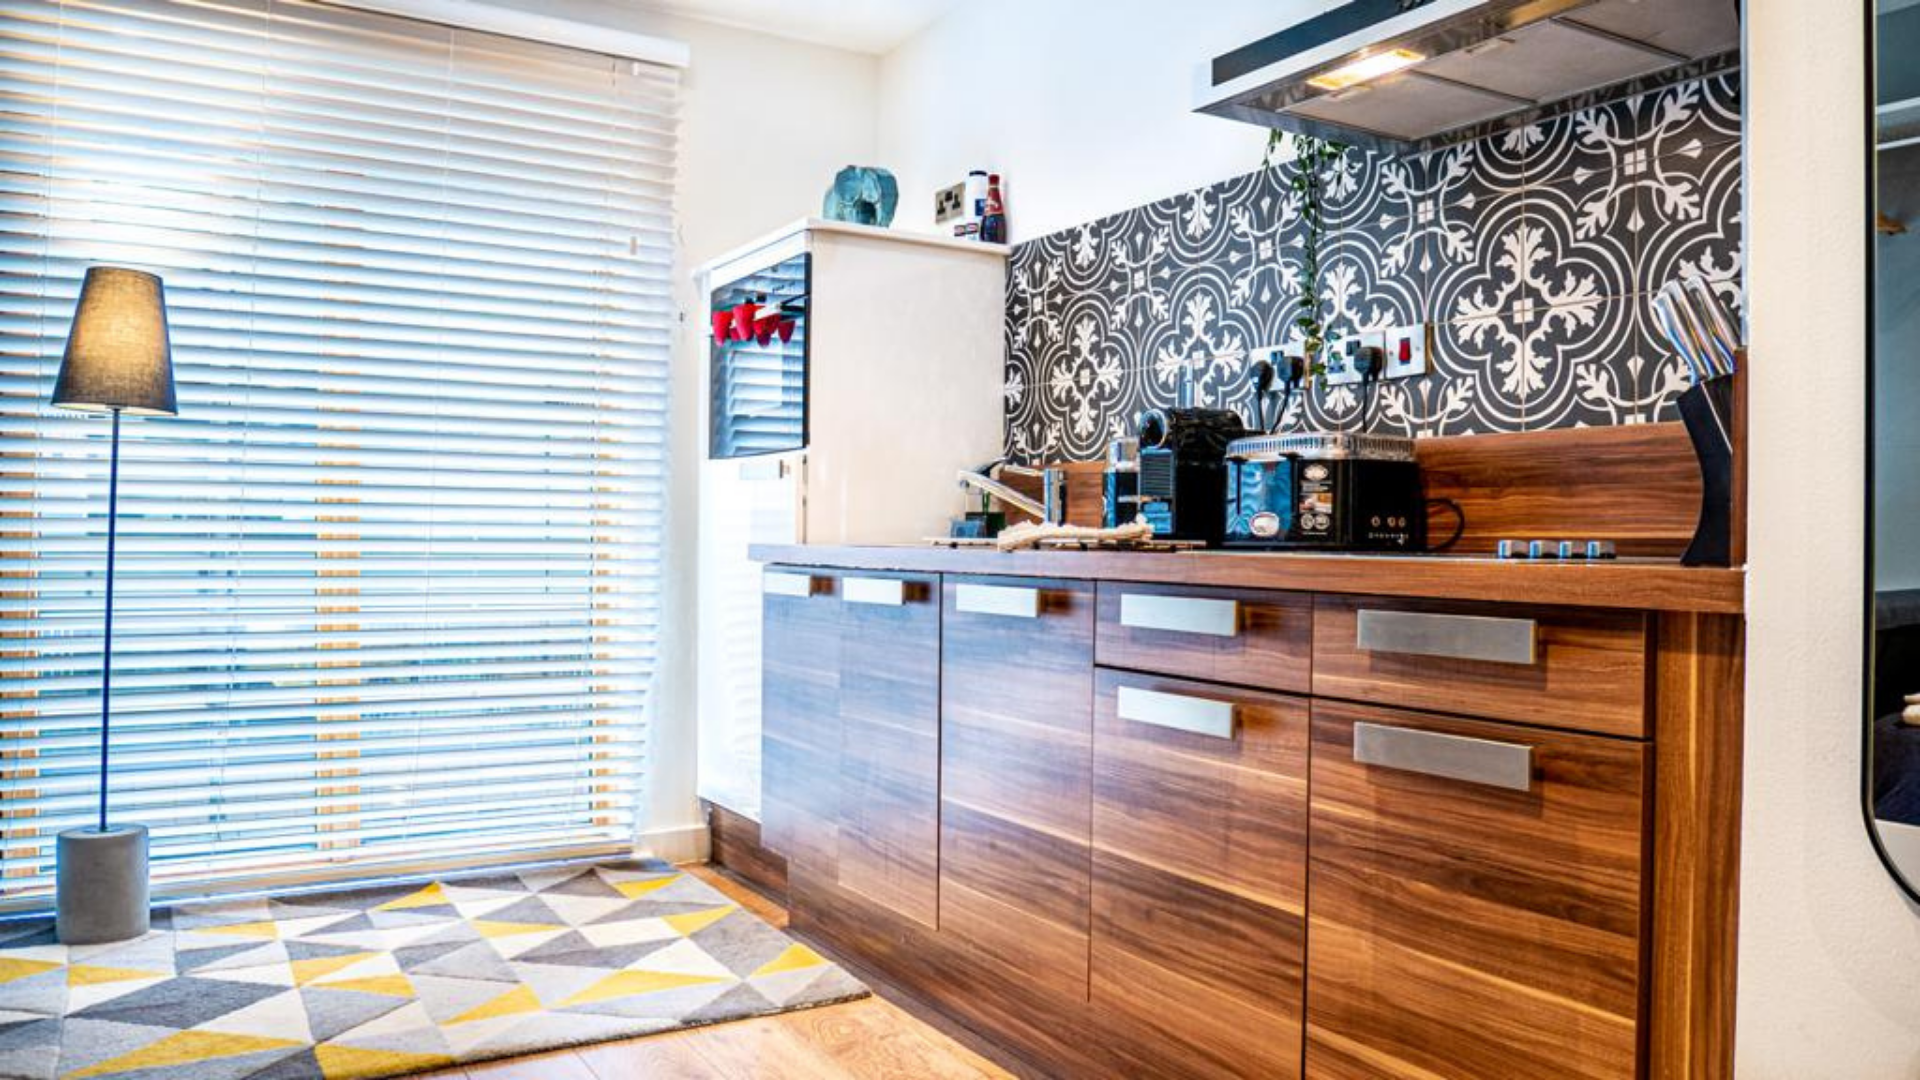 Kitchen at Quarter Blonk Street Apartments, Centre, Sheffield - Citybase Apartments